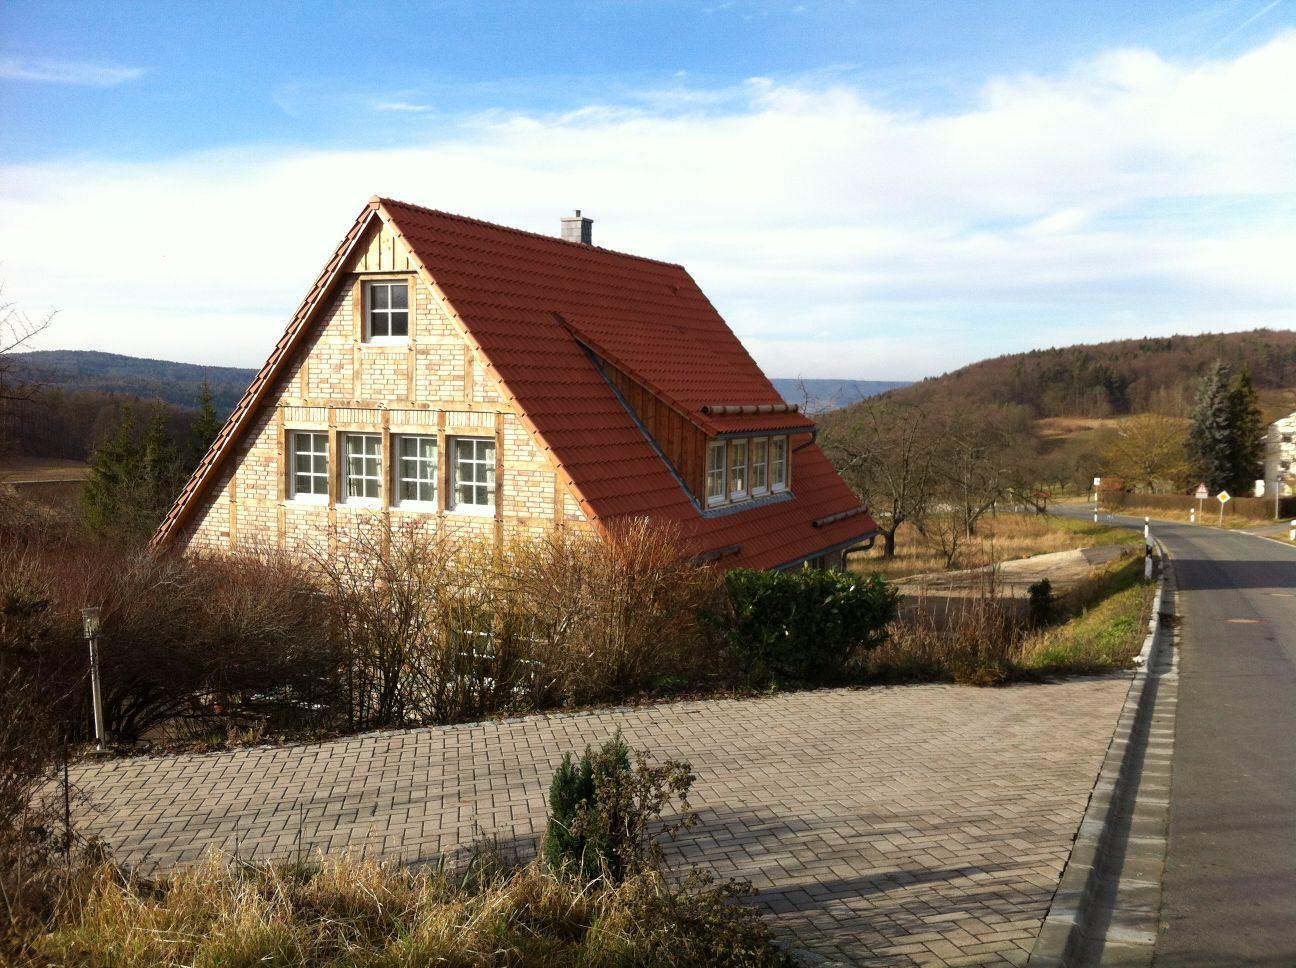 Sattelmannsburg